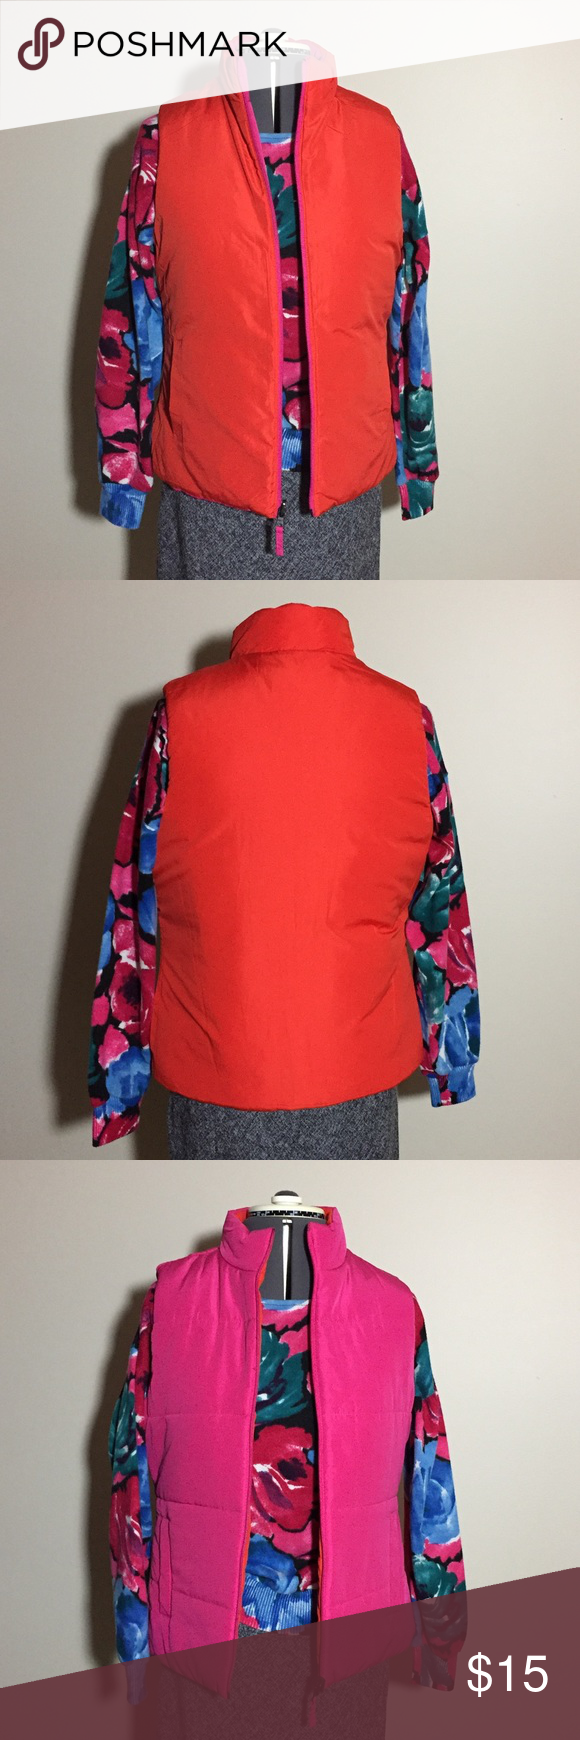 Orange & Pink Reversible Puffer Vest Pink and orange